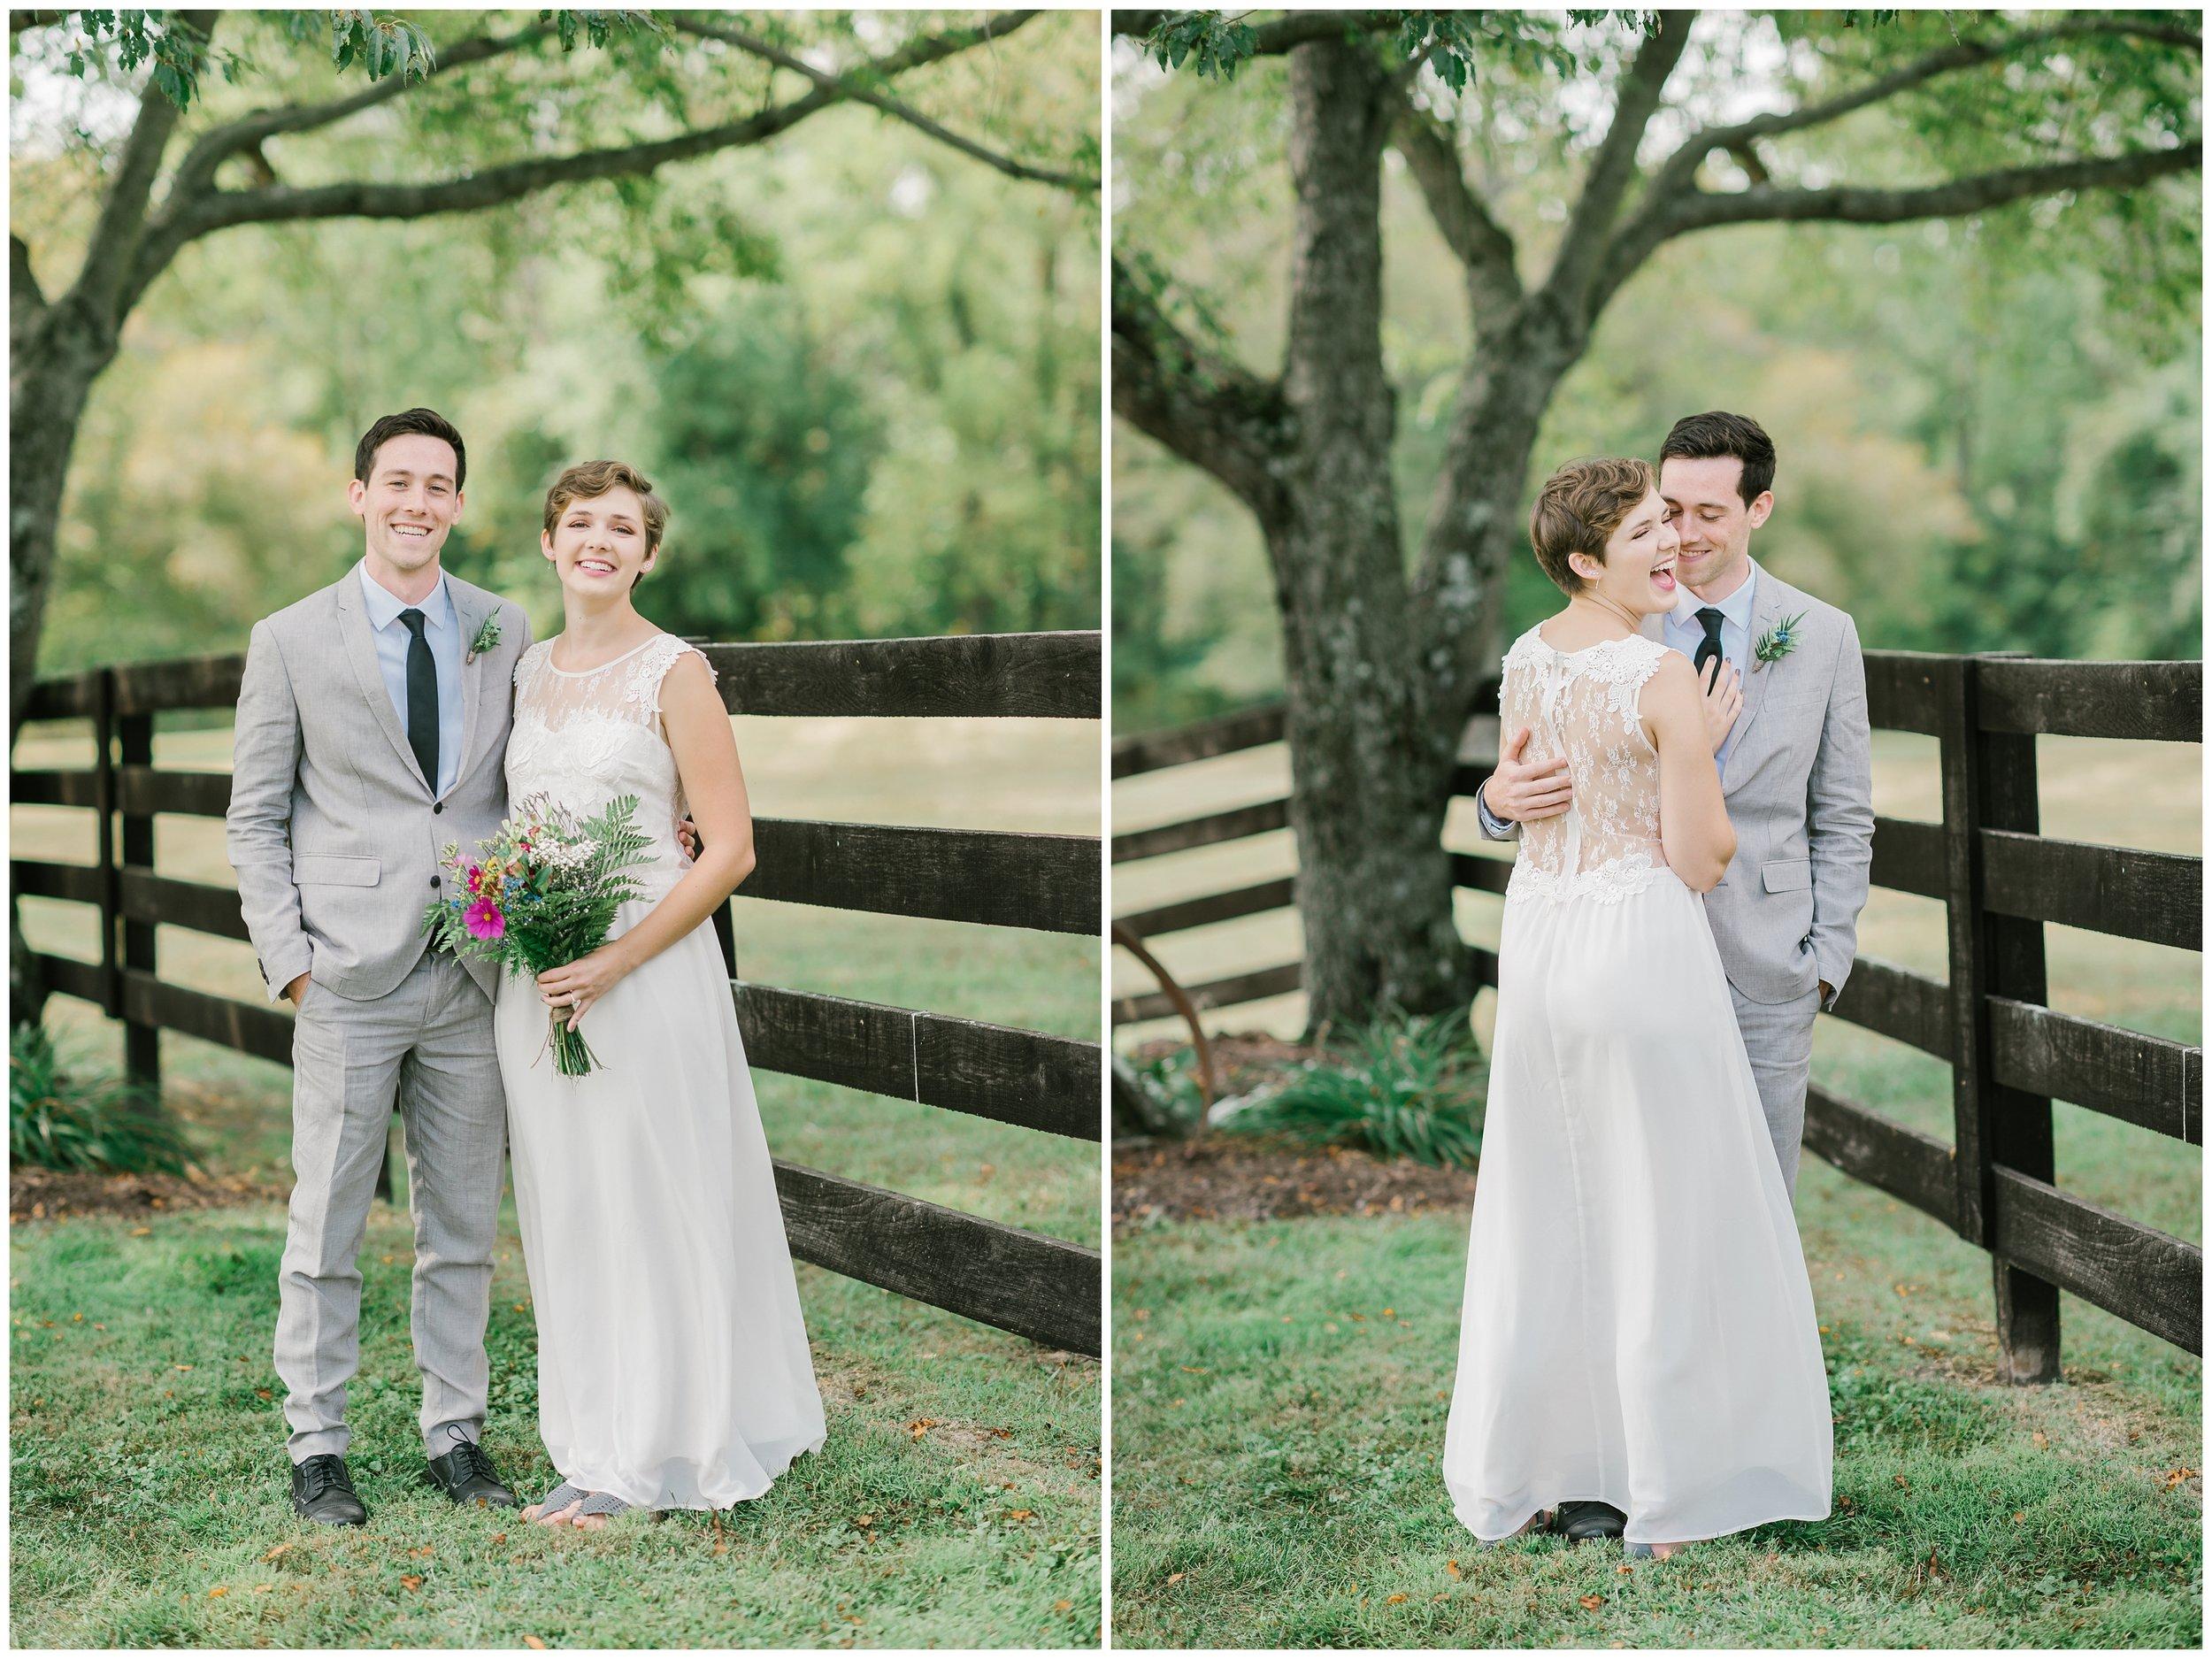 Rebecca_Shehorn_Photography_Indianapolis_Wedding_Photographer_7233.jpg